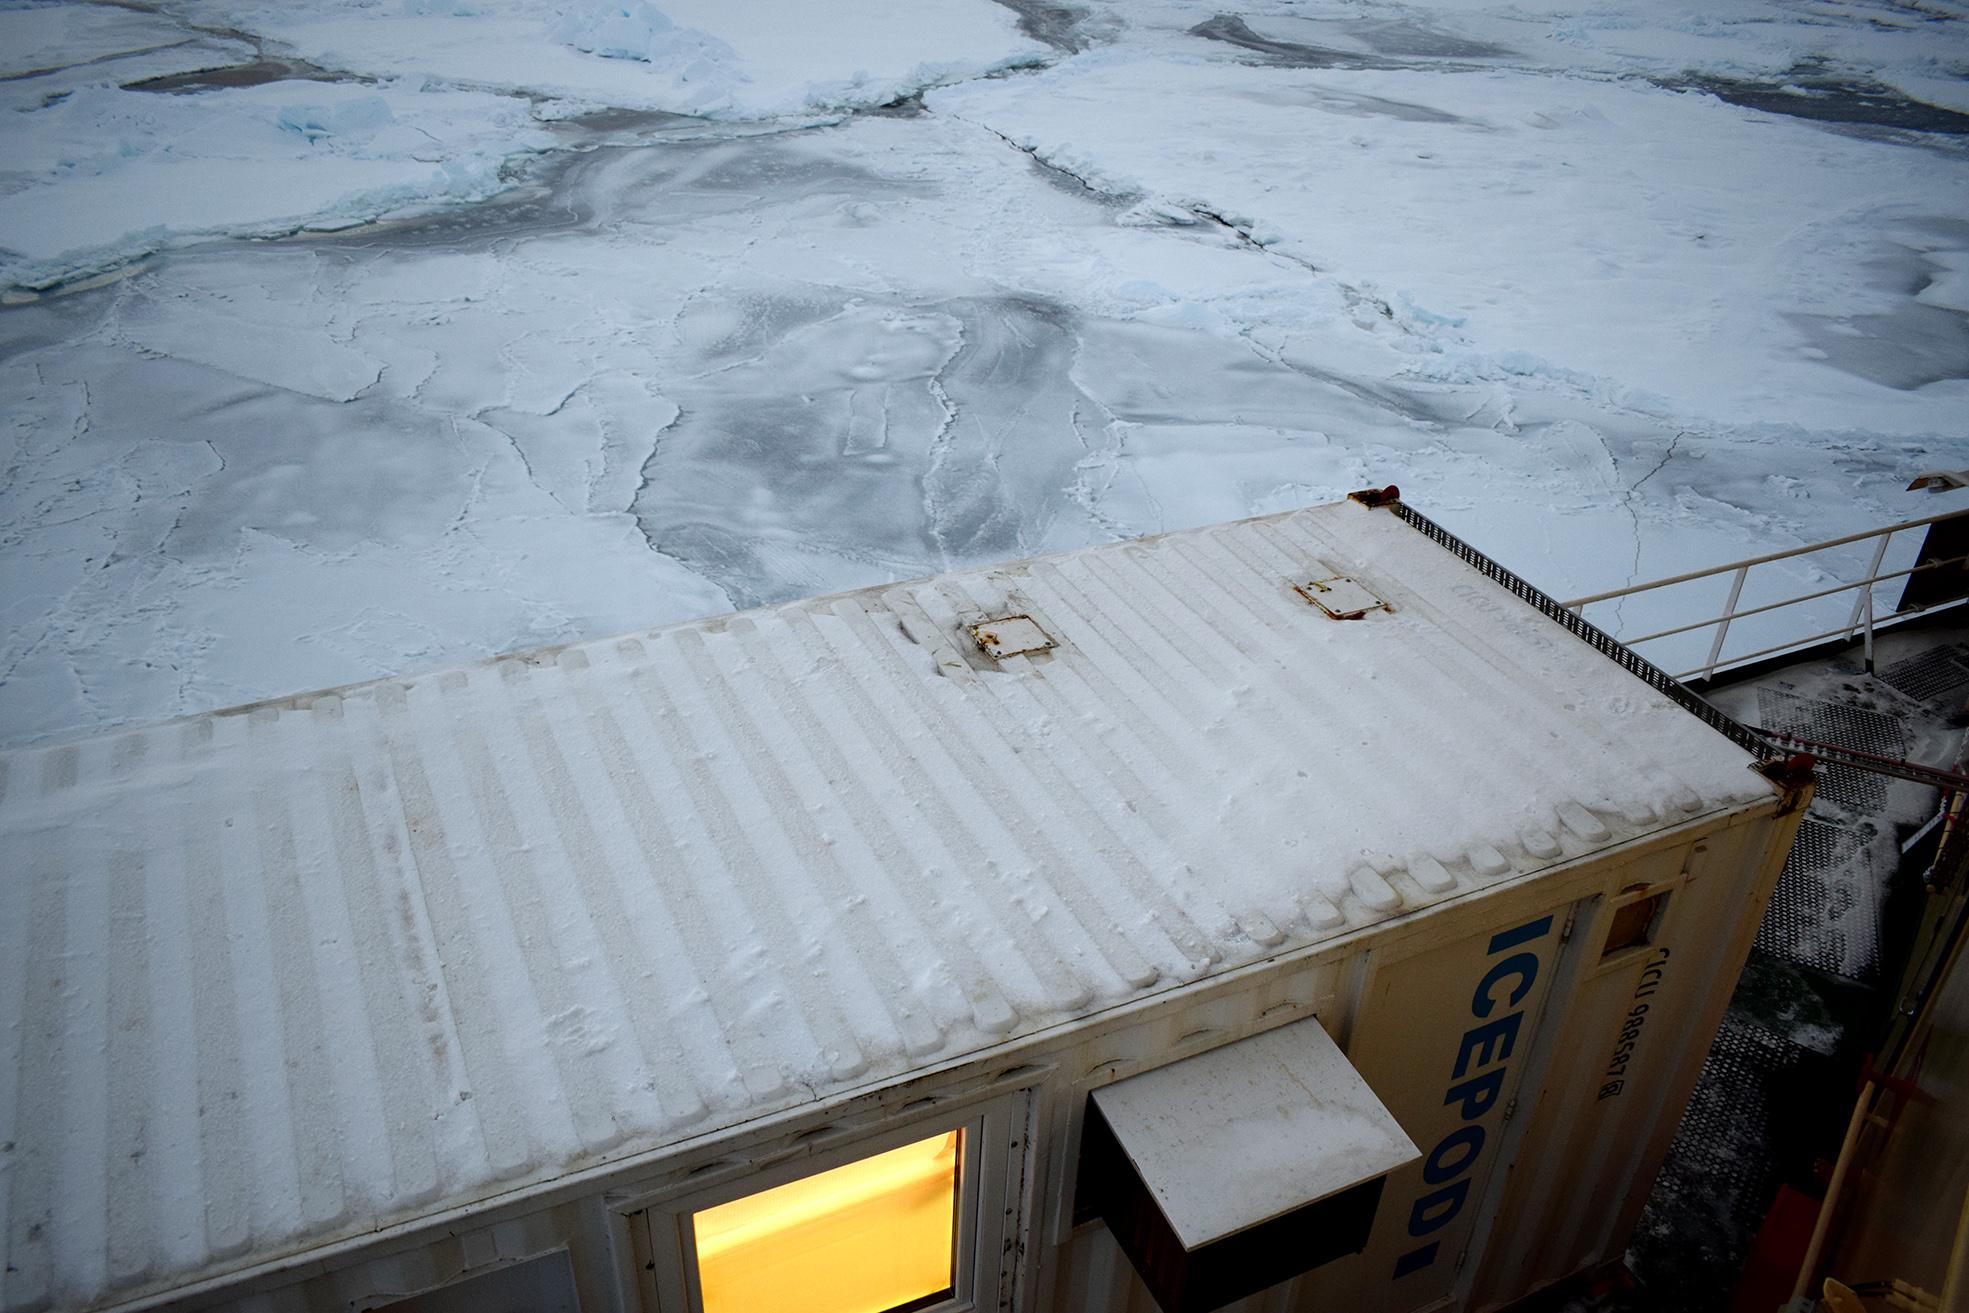 I containerlaboratoriet analyserades proverna. Foto: Grace Porter